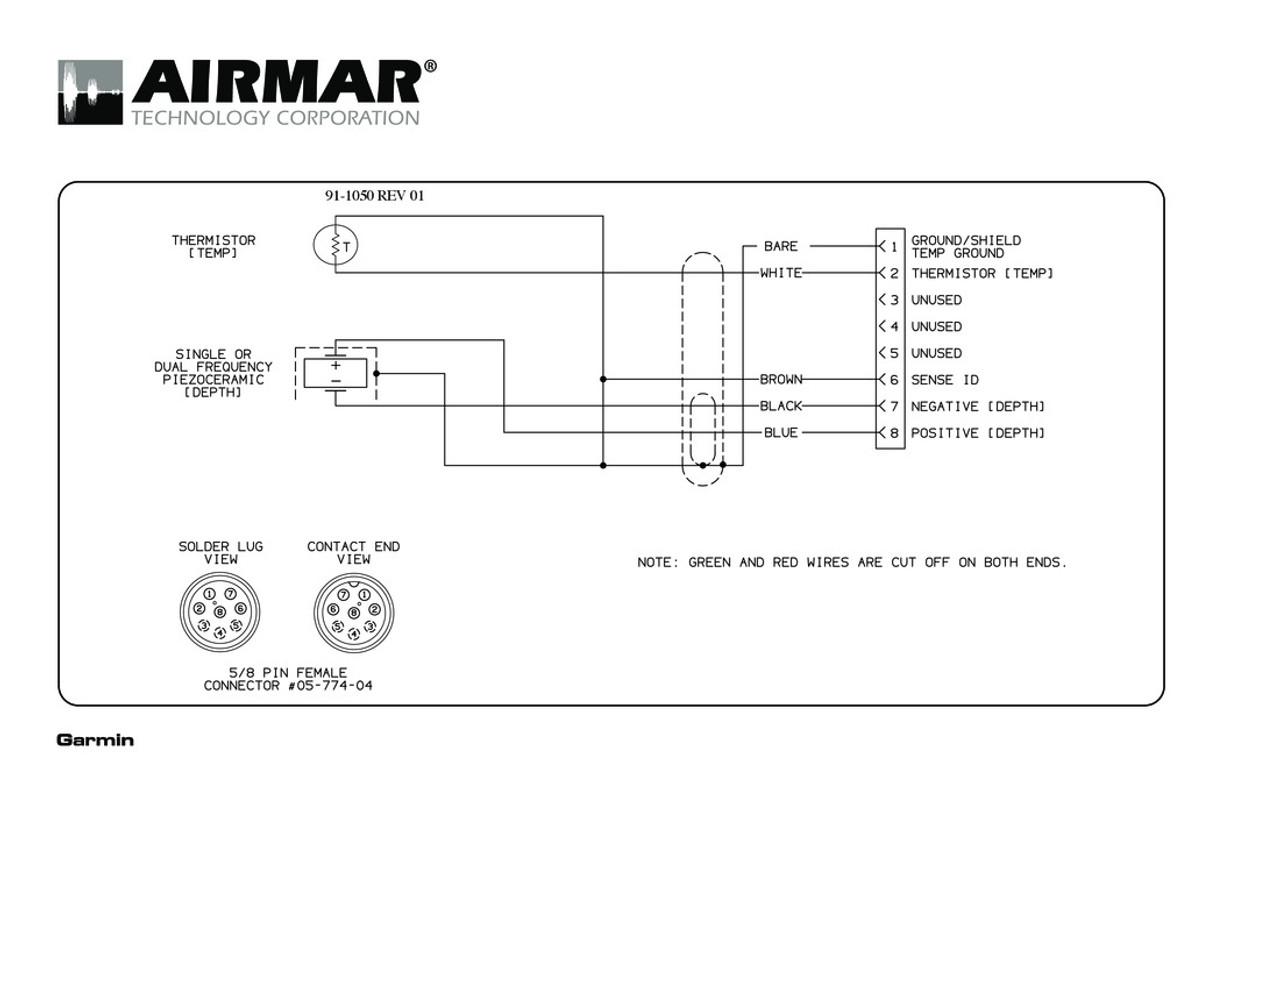 hight resolution of airmar wiring diagram garmin p319 8 pin d t blue bottle marine rh bluebottlemarine com 7 pin wiring diagram trailer 7 pin wiring diagram pdf